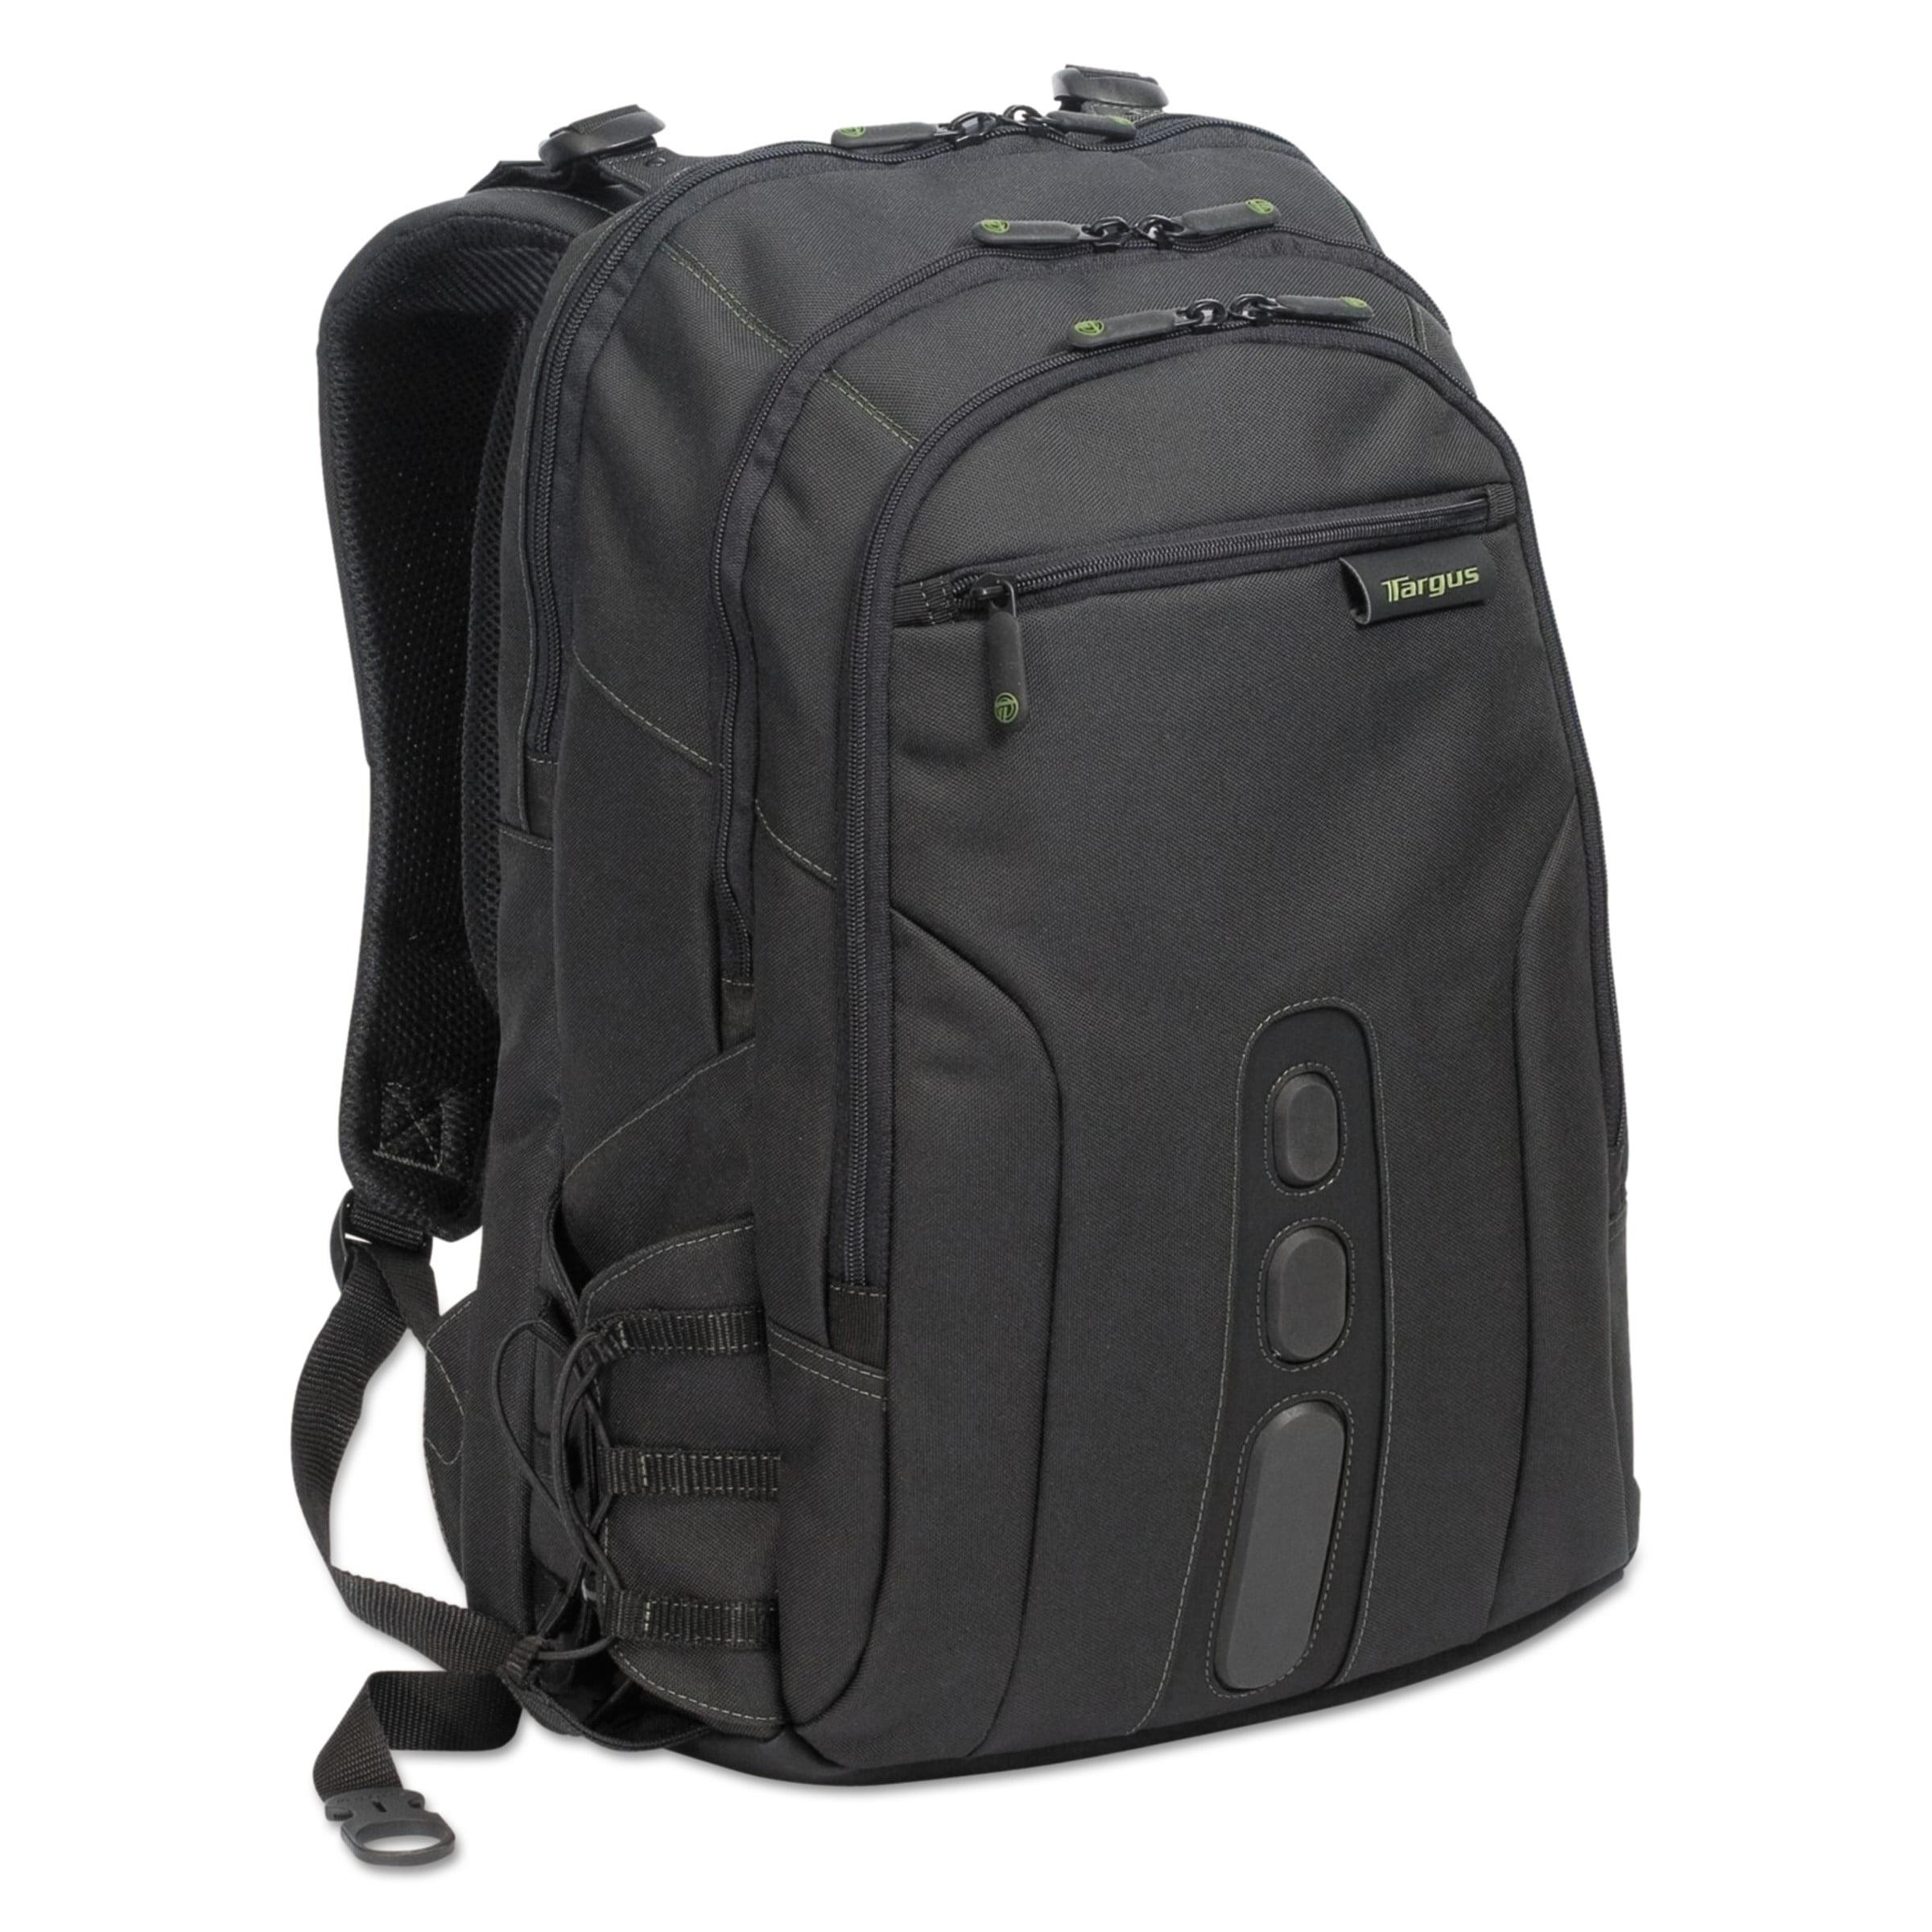 "Targus Spruce Ecosmart Backpack 17"" Laptop, 19 1/2 x 13 x 6 3/4, Black"